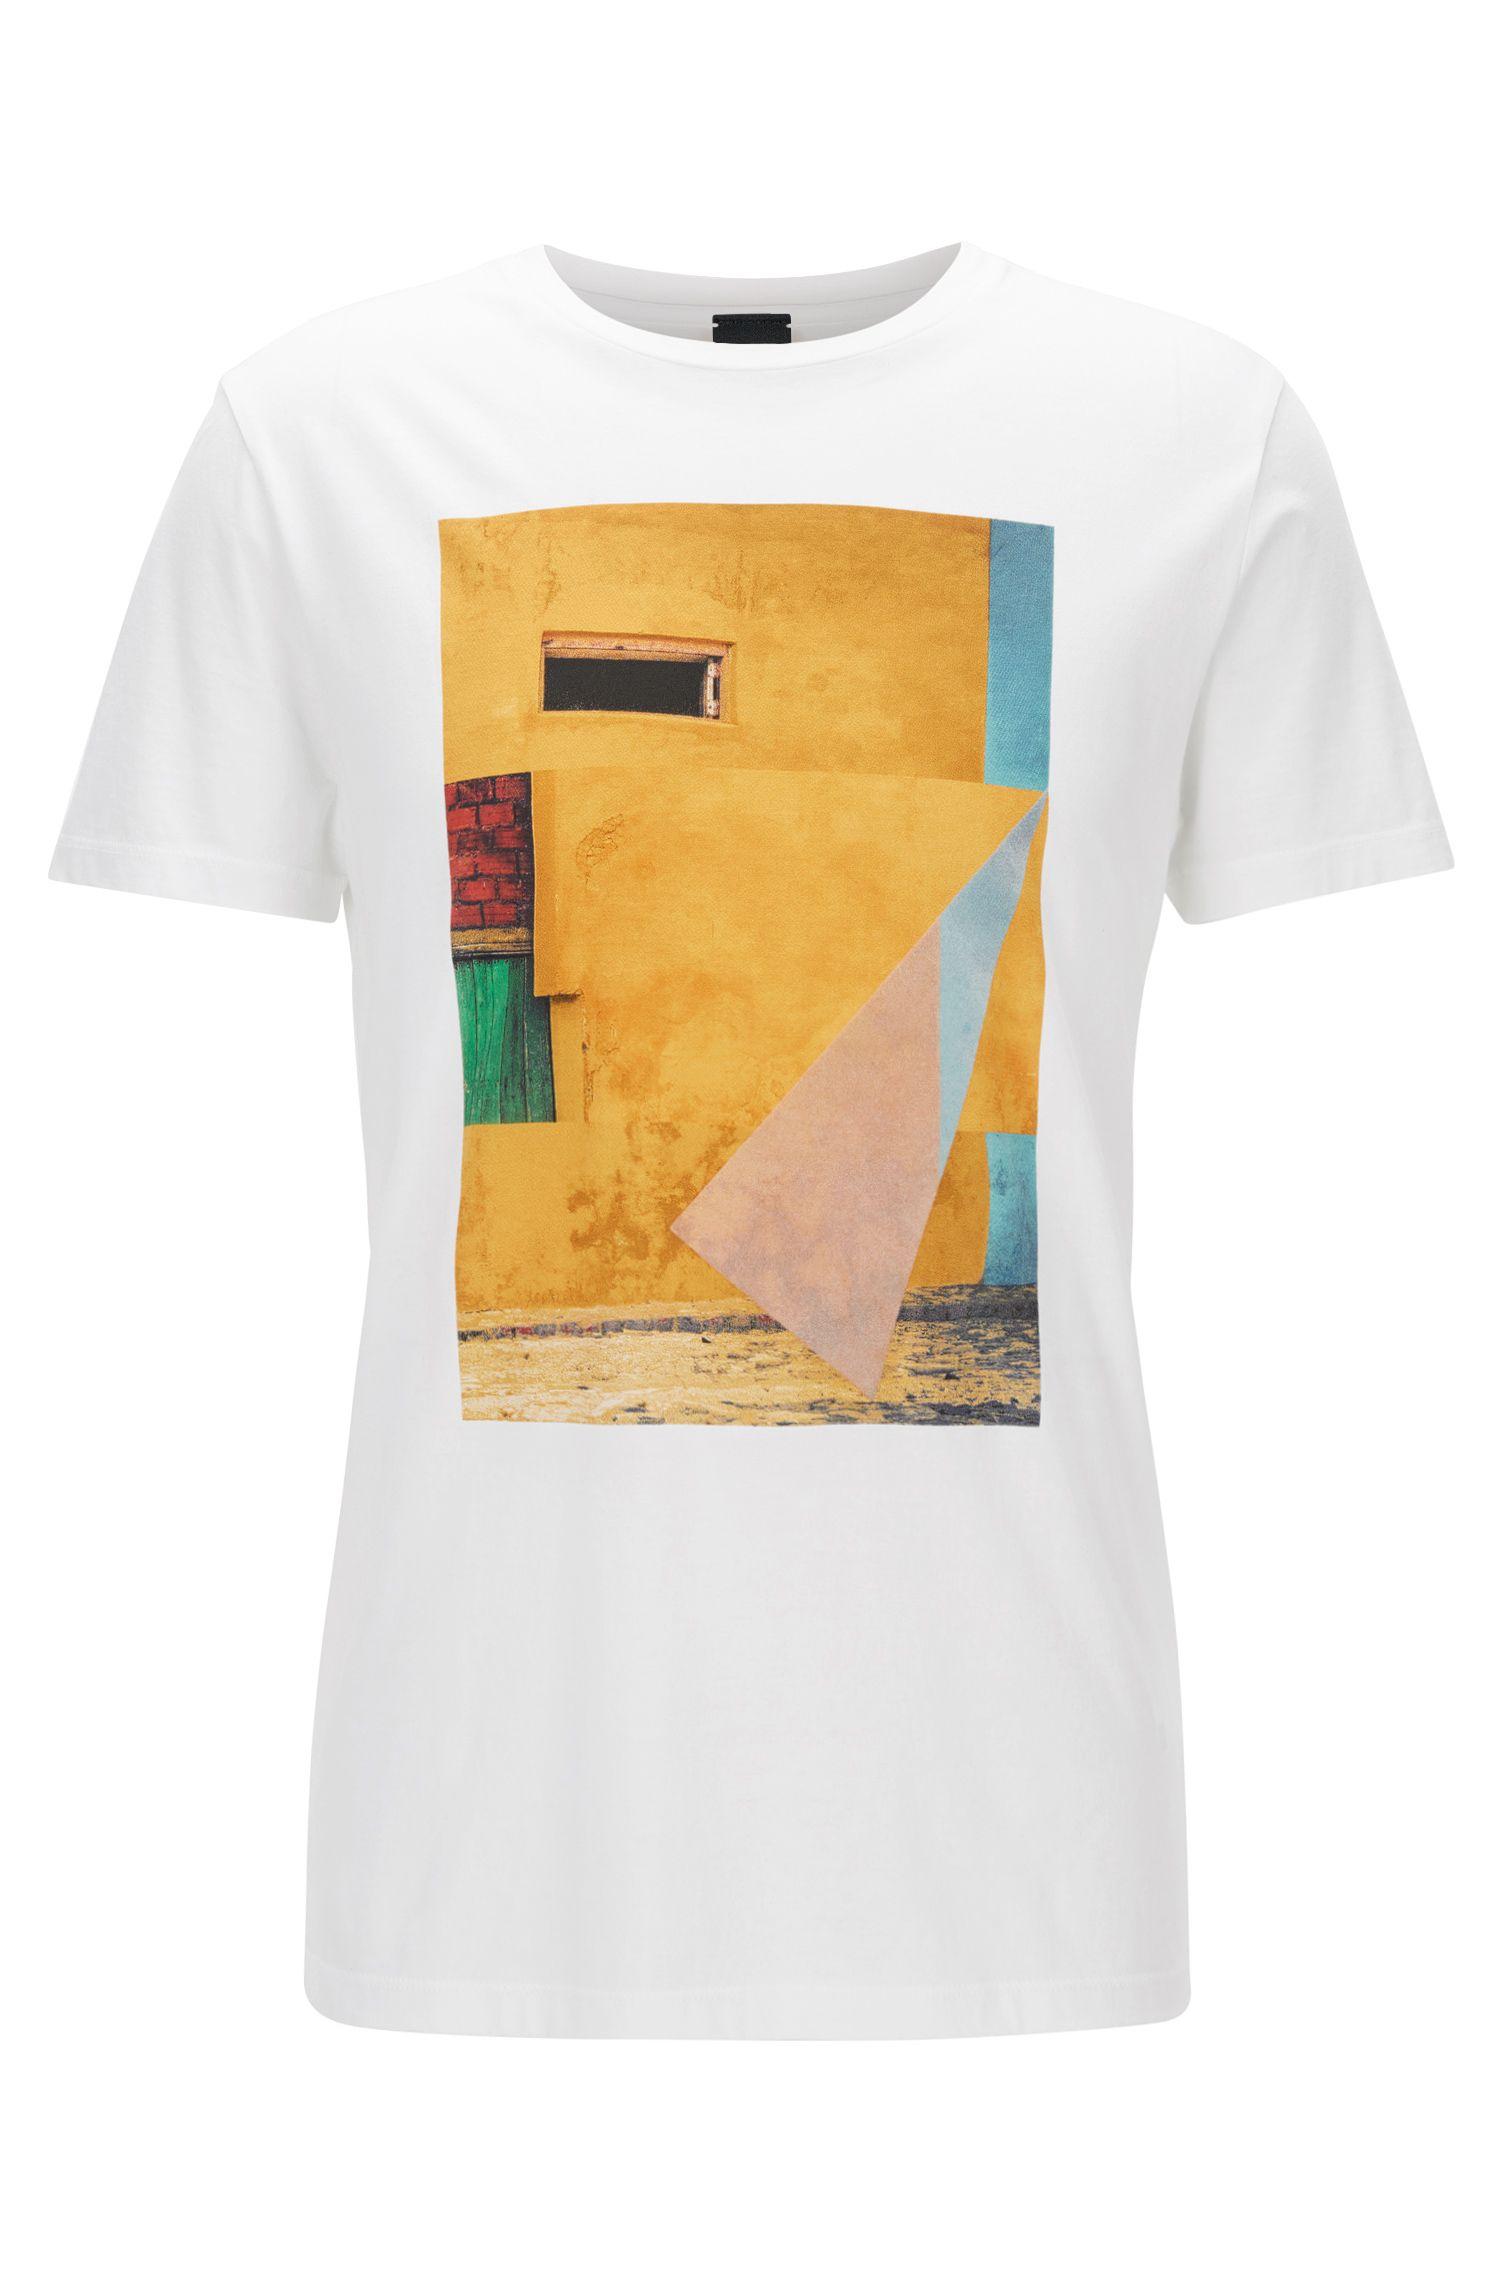 Cuba-Print Cotton Graphic T-Shirt | Turbulent